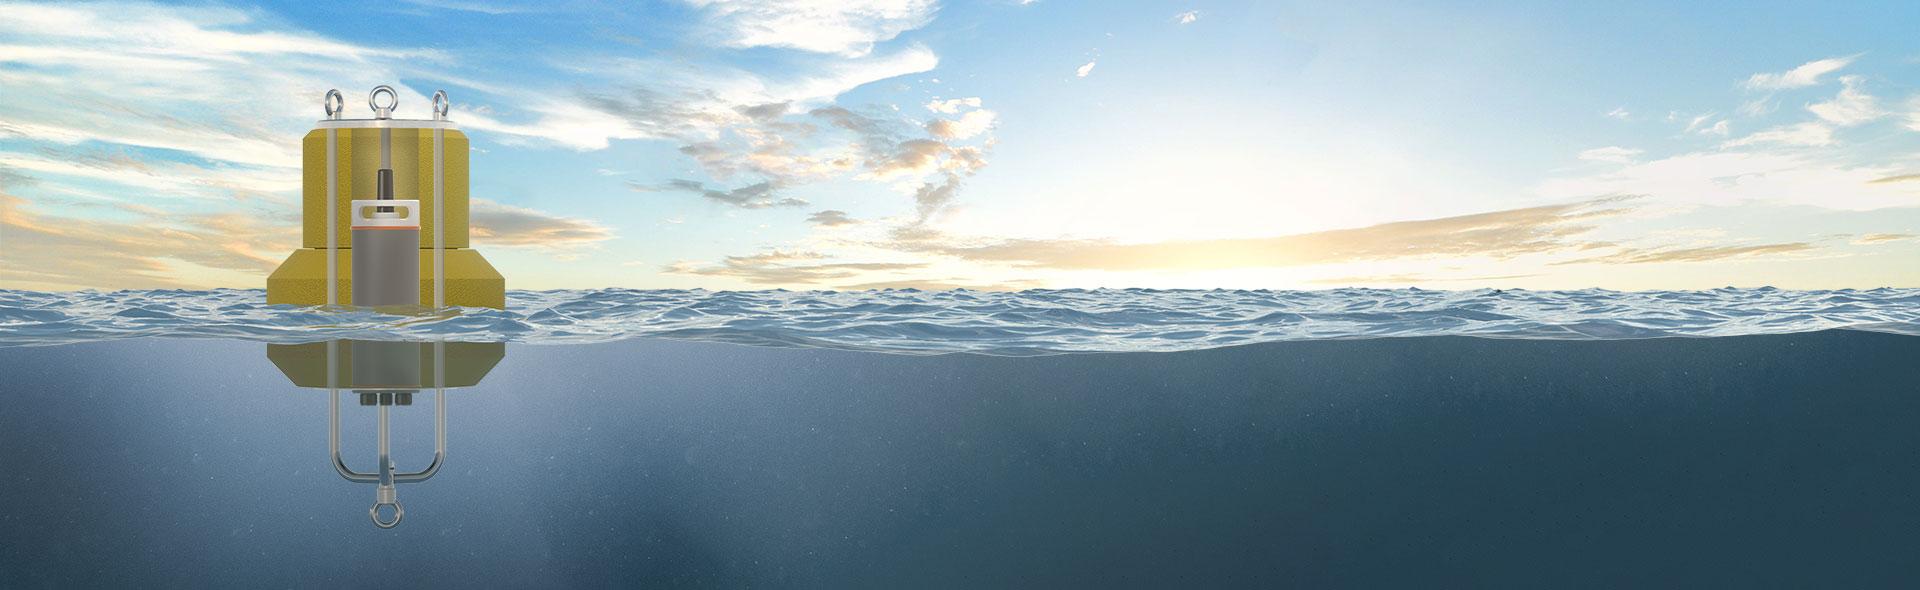 X2-SDL Submersible Data Logger